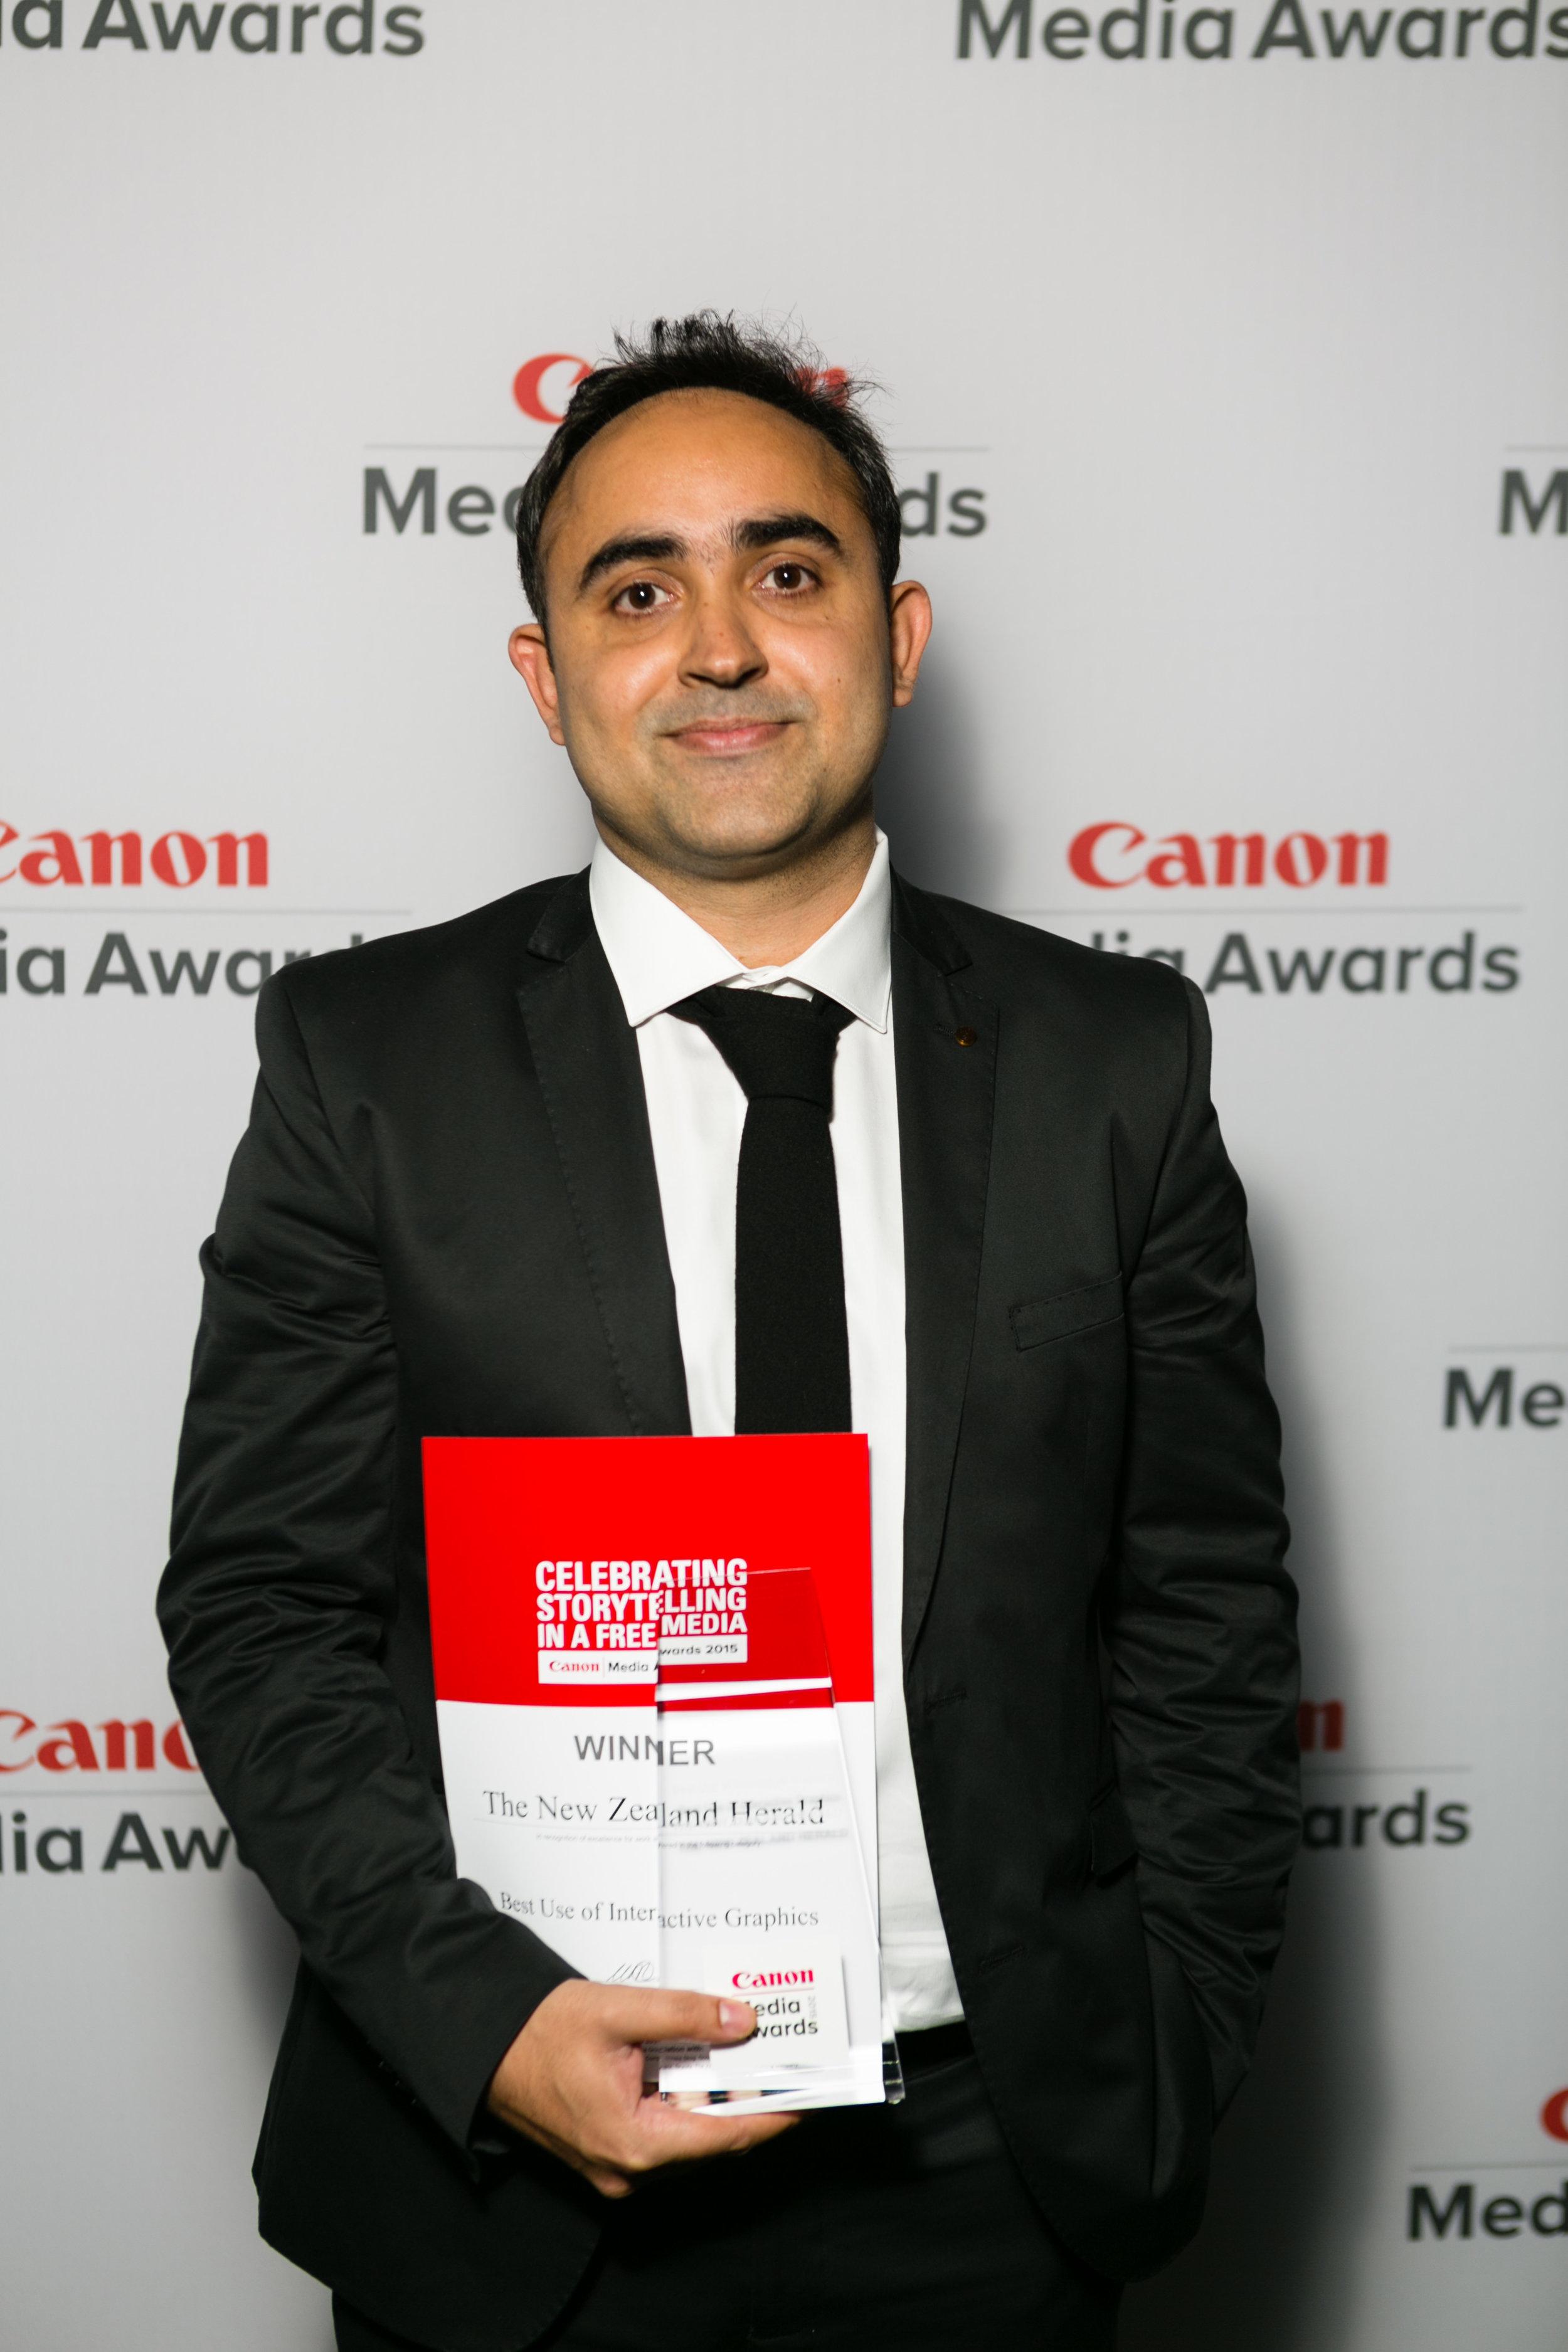 canon_media_awards_2015_interlike_nz_clinton_tudor-5960-202.jpg